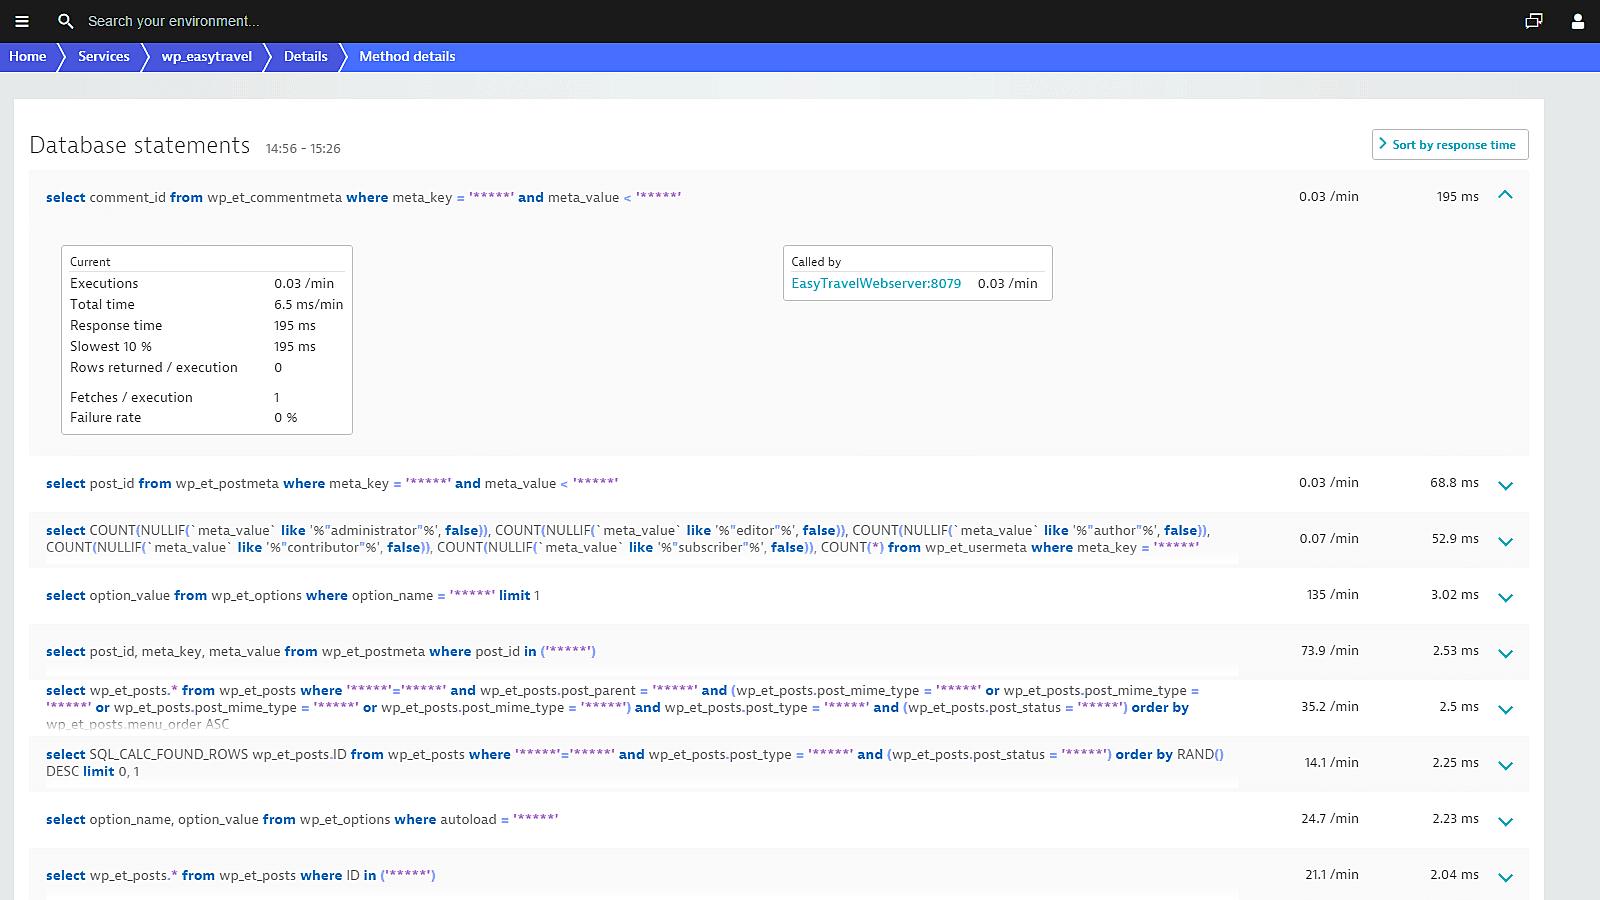 Mysql database overview queries 1600 0c1ed56672 1